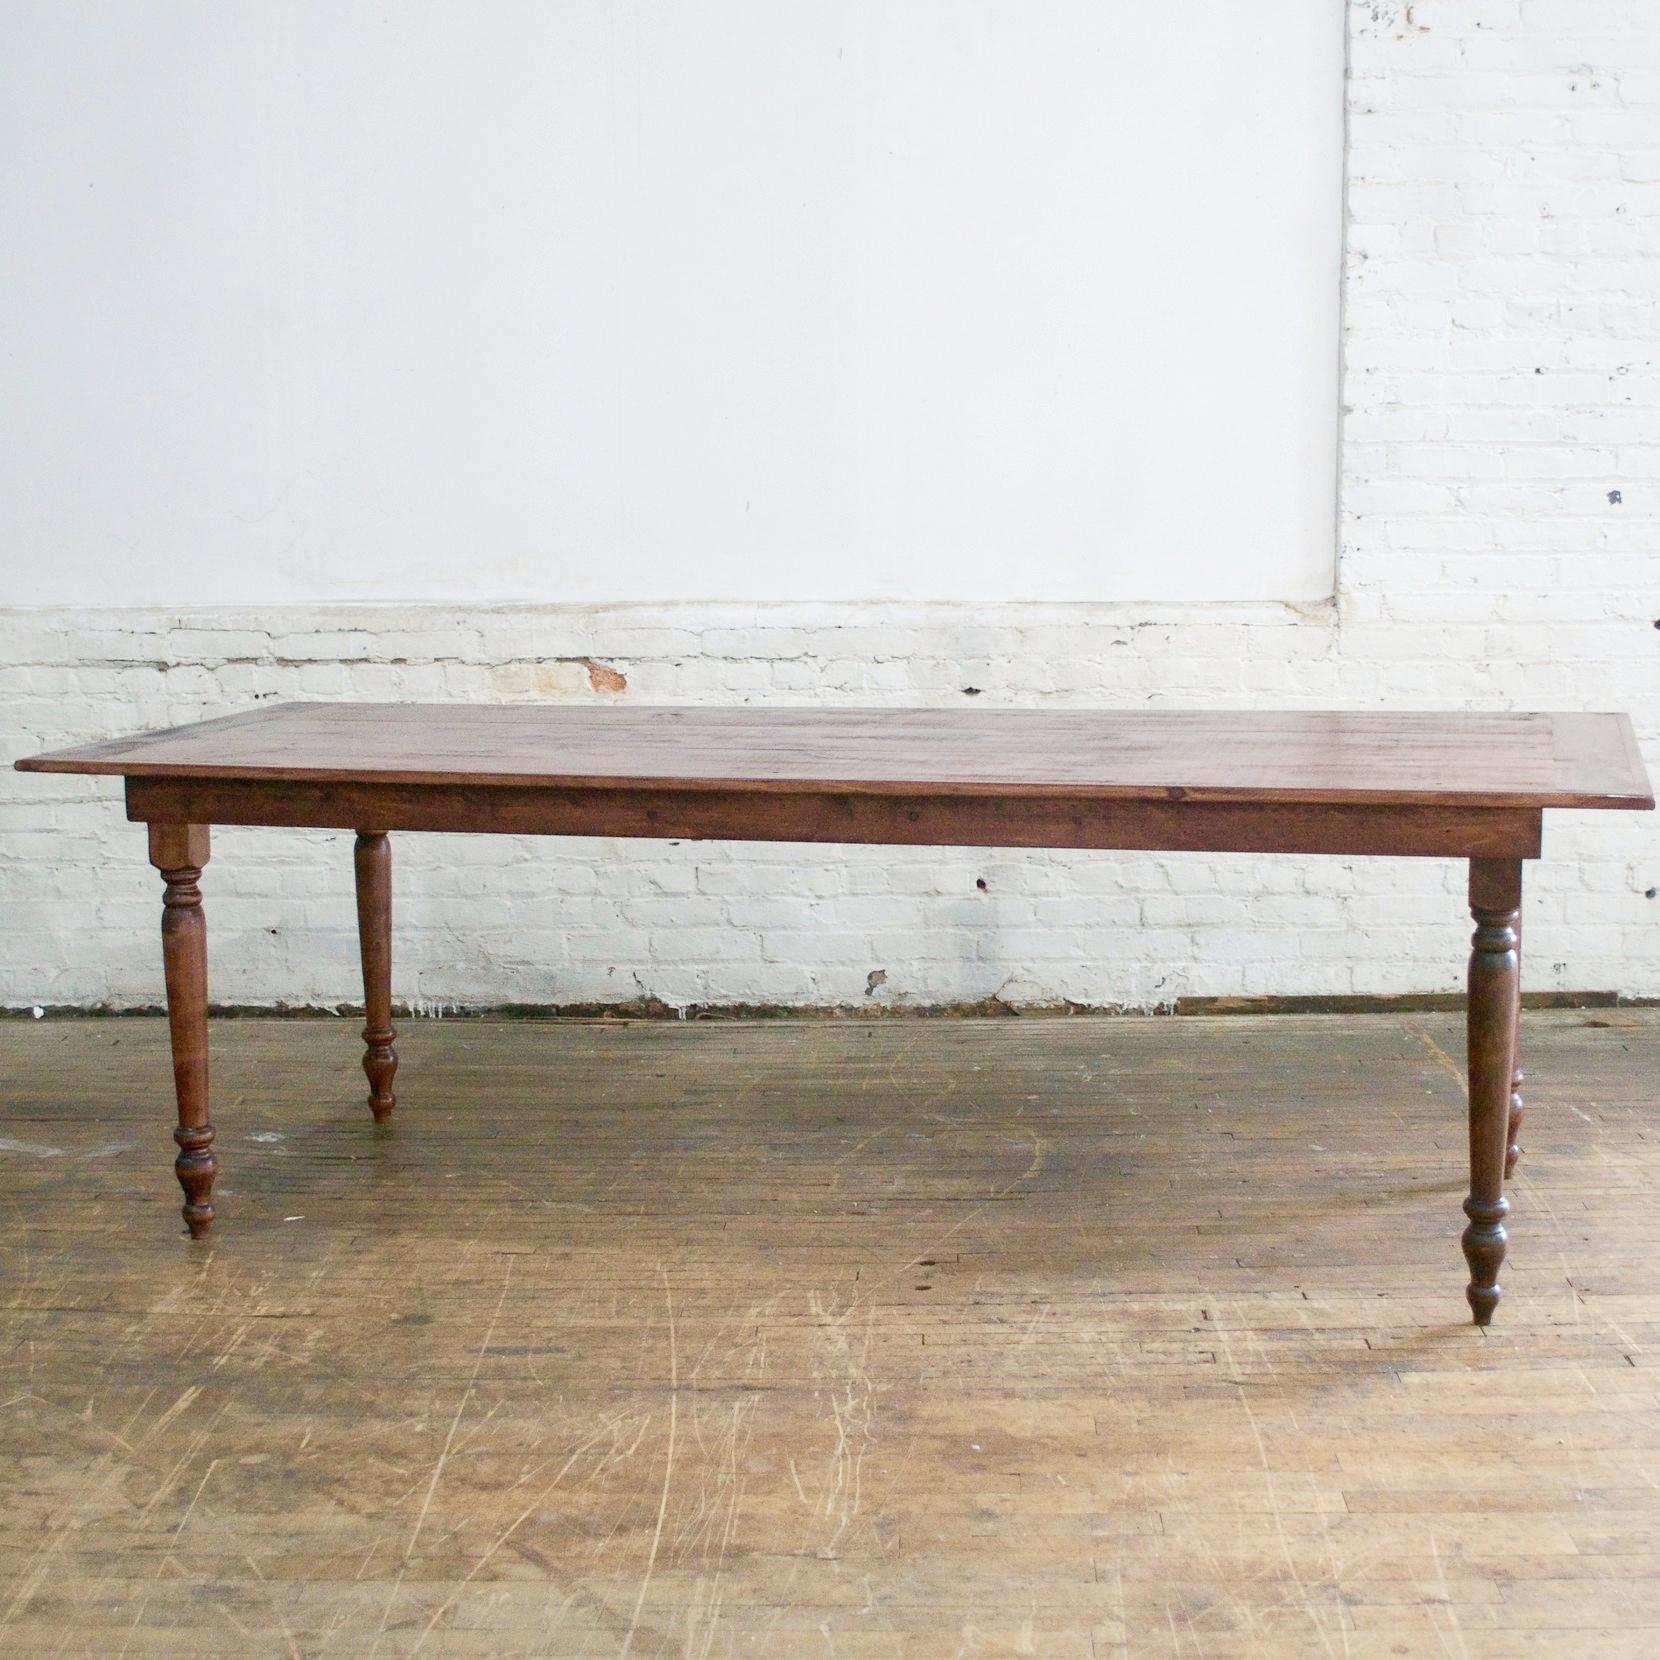 Redford Farm Tables    Inquire for availability    8'l x 3' w